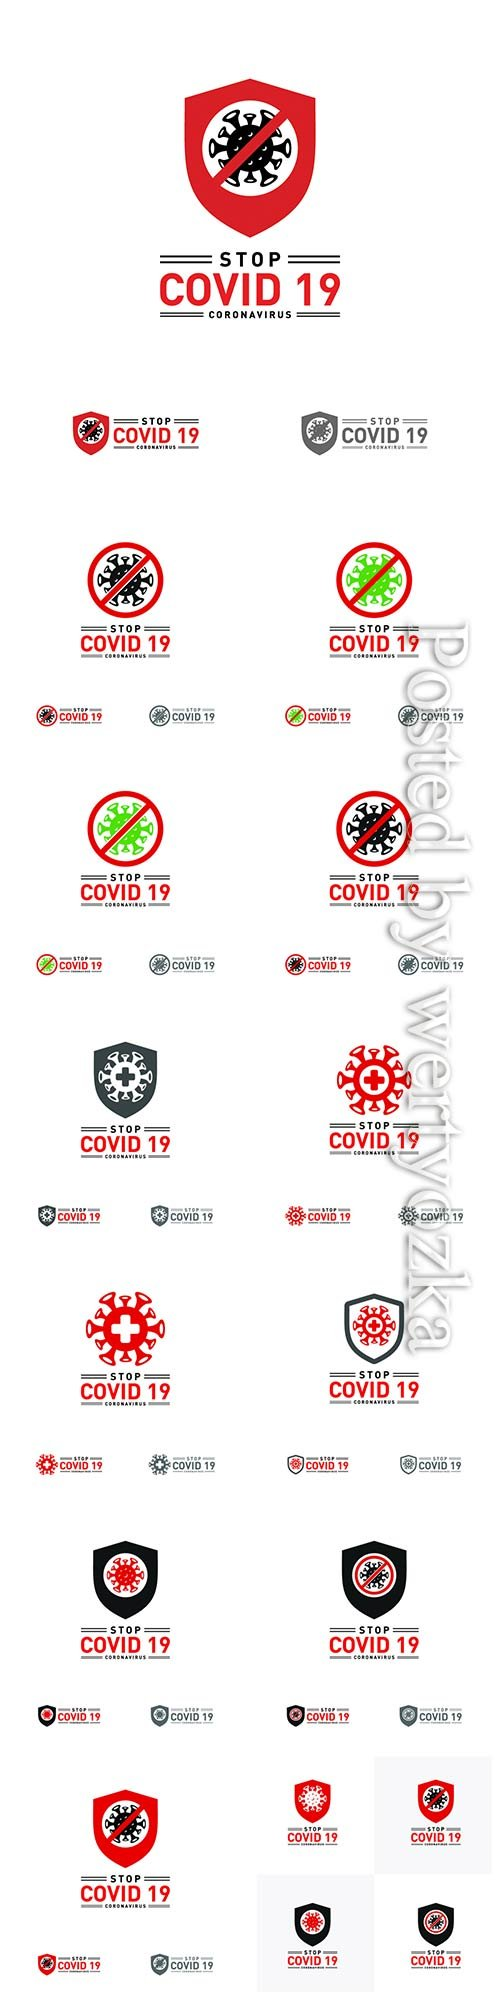 COVID 19, Coranavirus vector illustration sets # 23